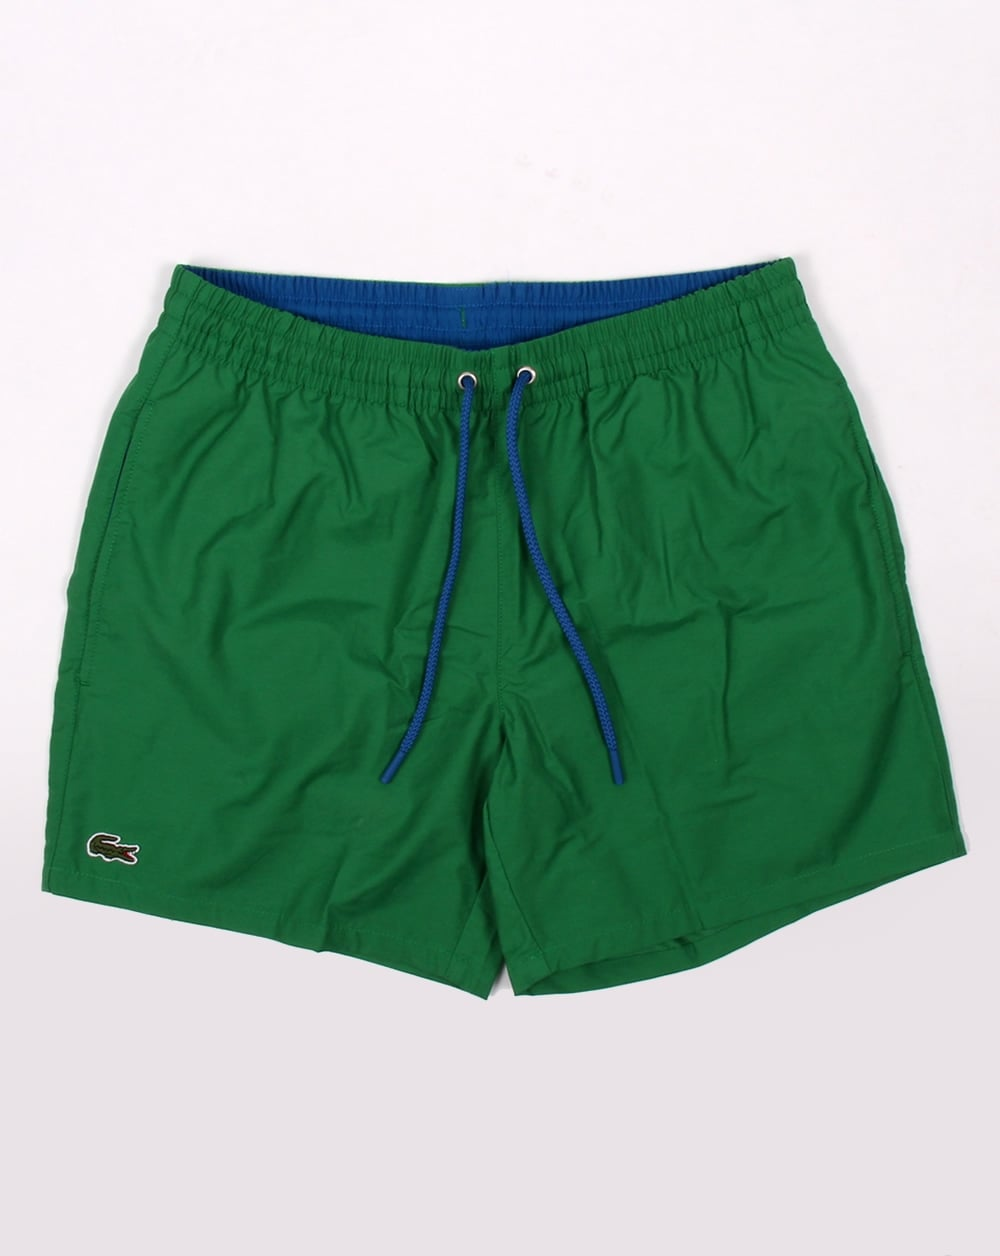 b695b12f42eb Lacoste Lacoste Swim Shorts Rocket sapphire